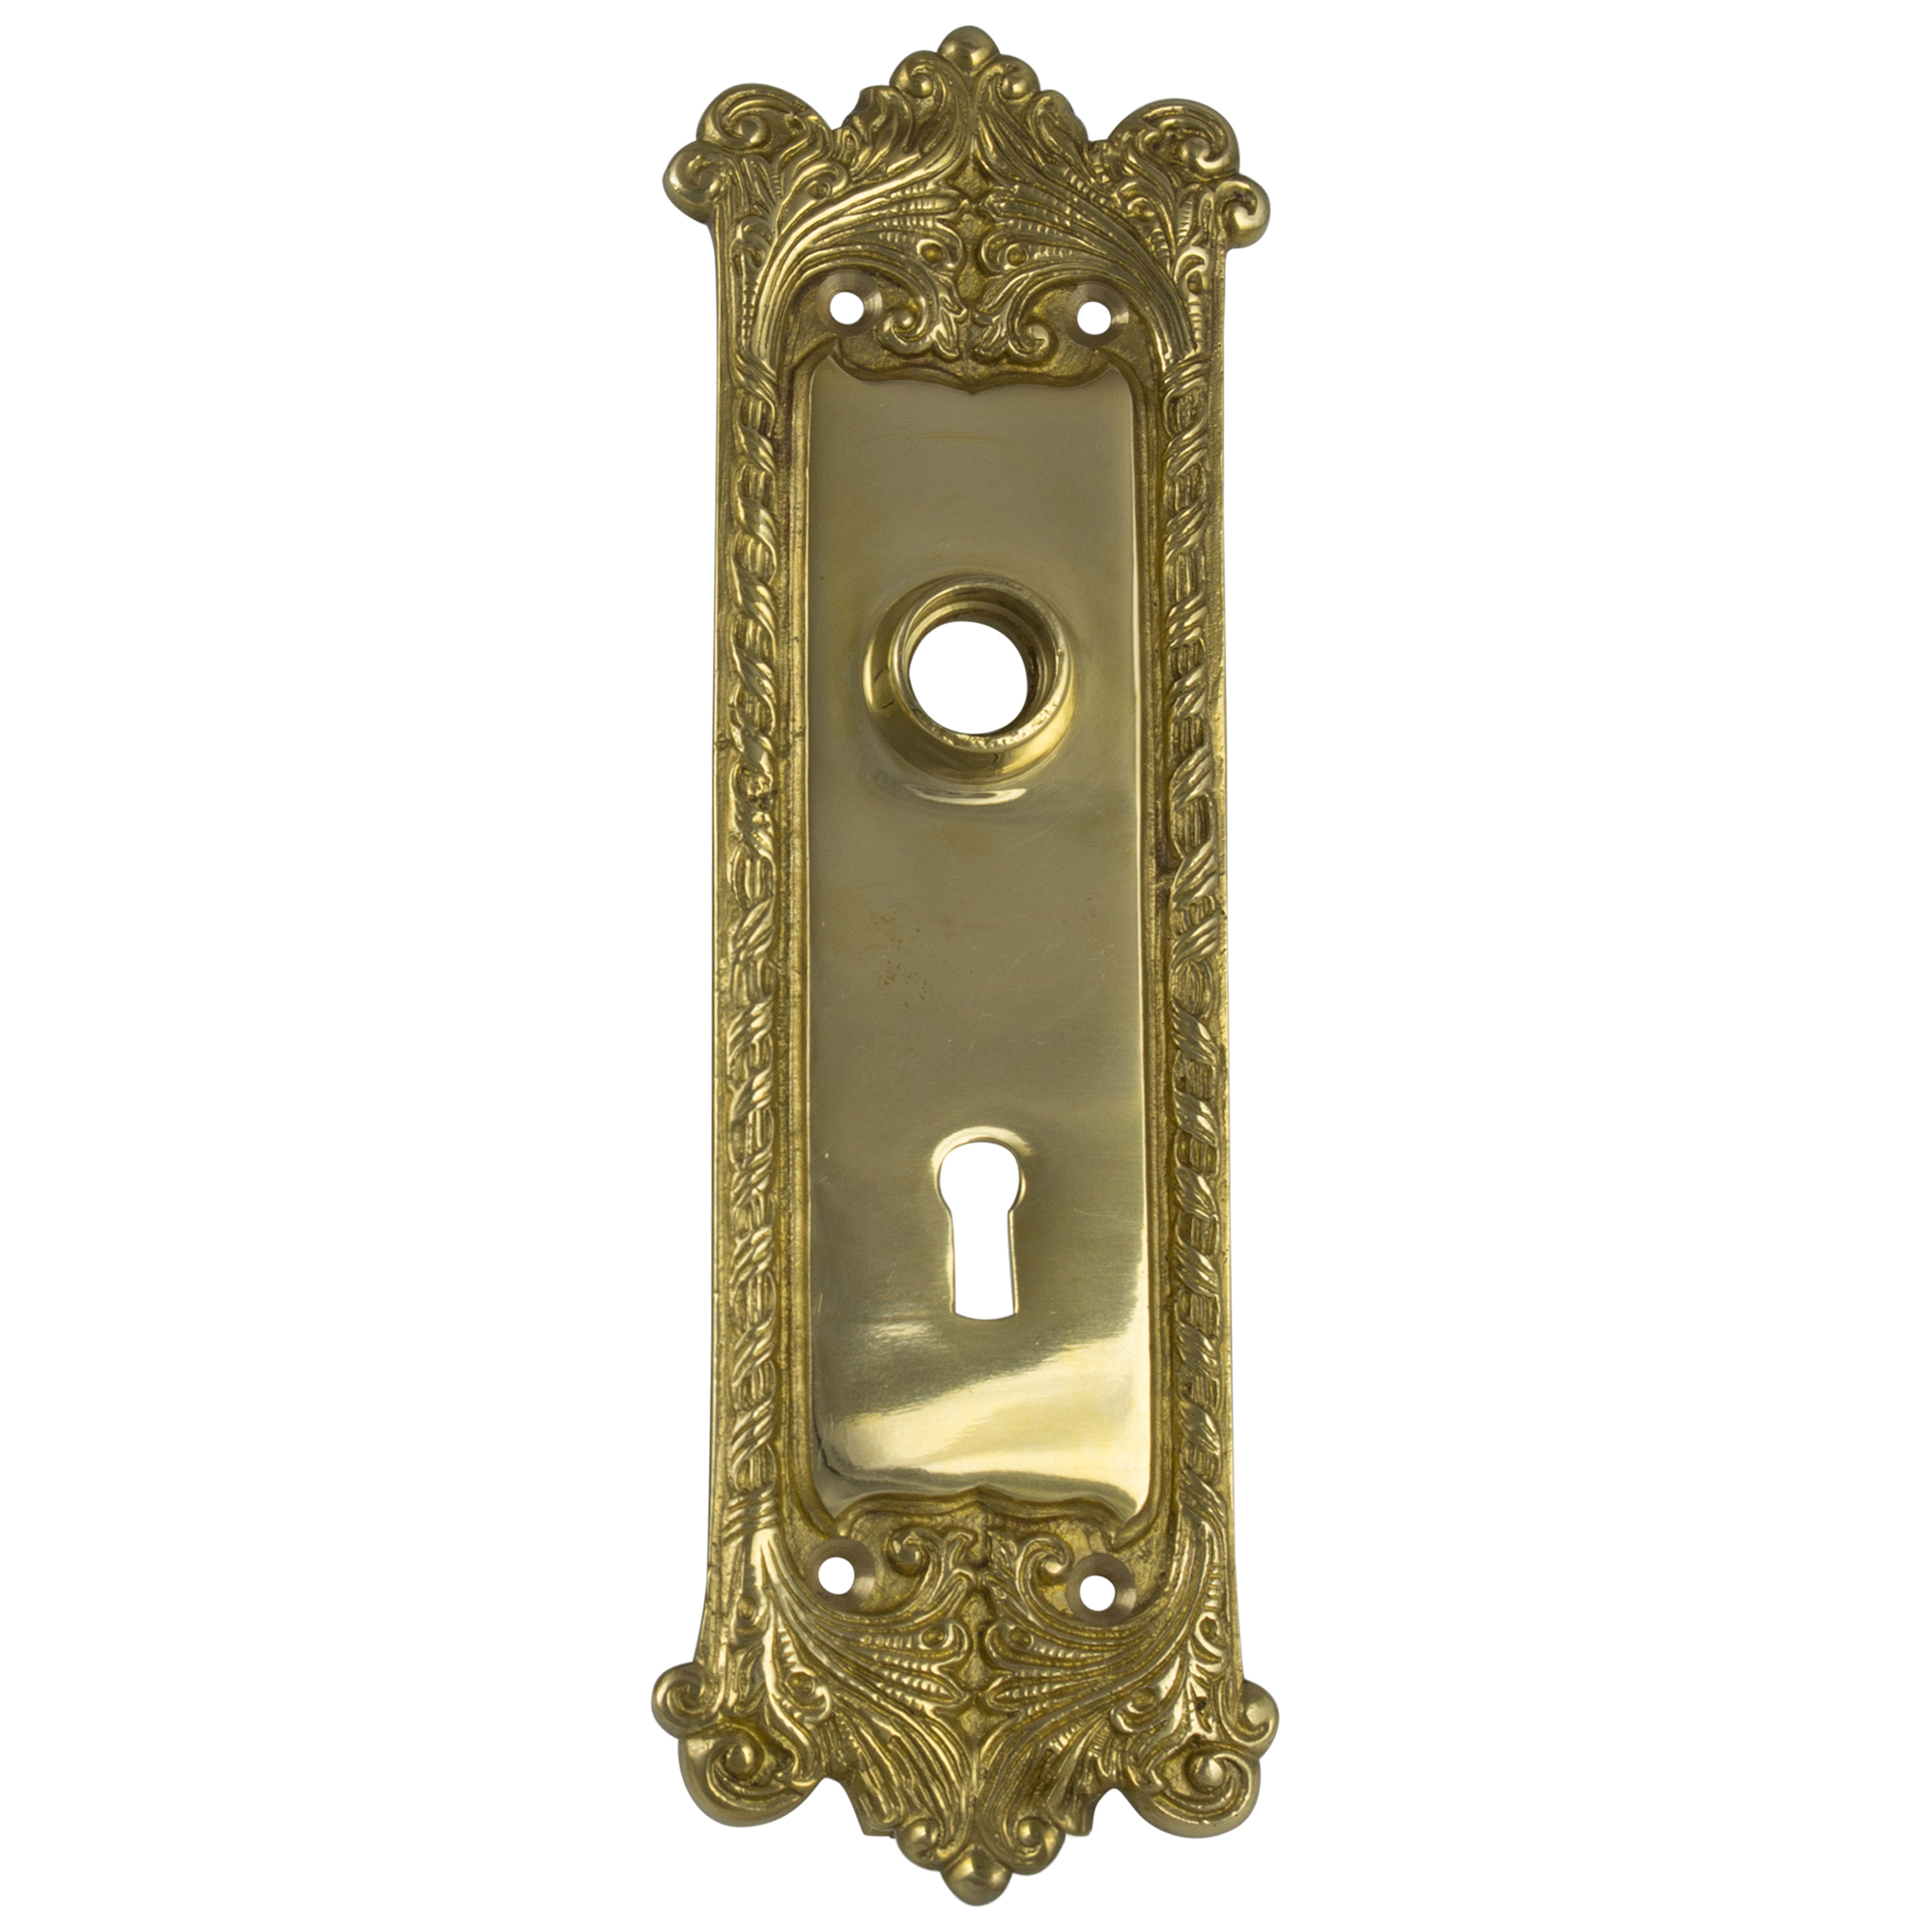 Classic Door BACK PLATE Hardware Brass Vintage Hardware Antique Replica